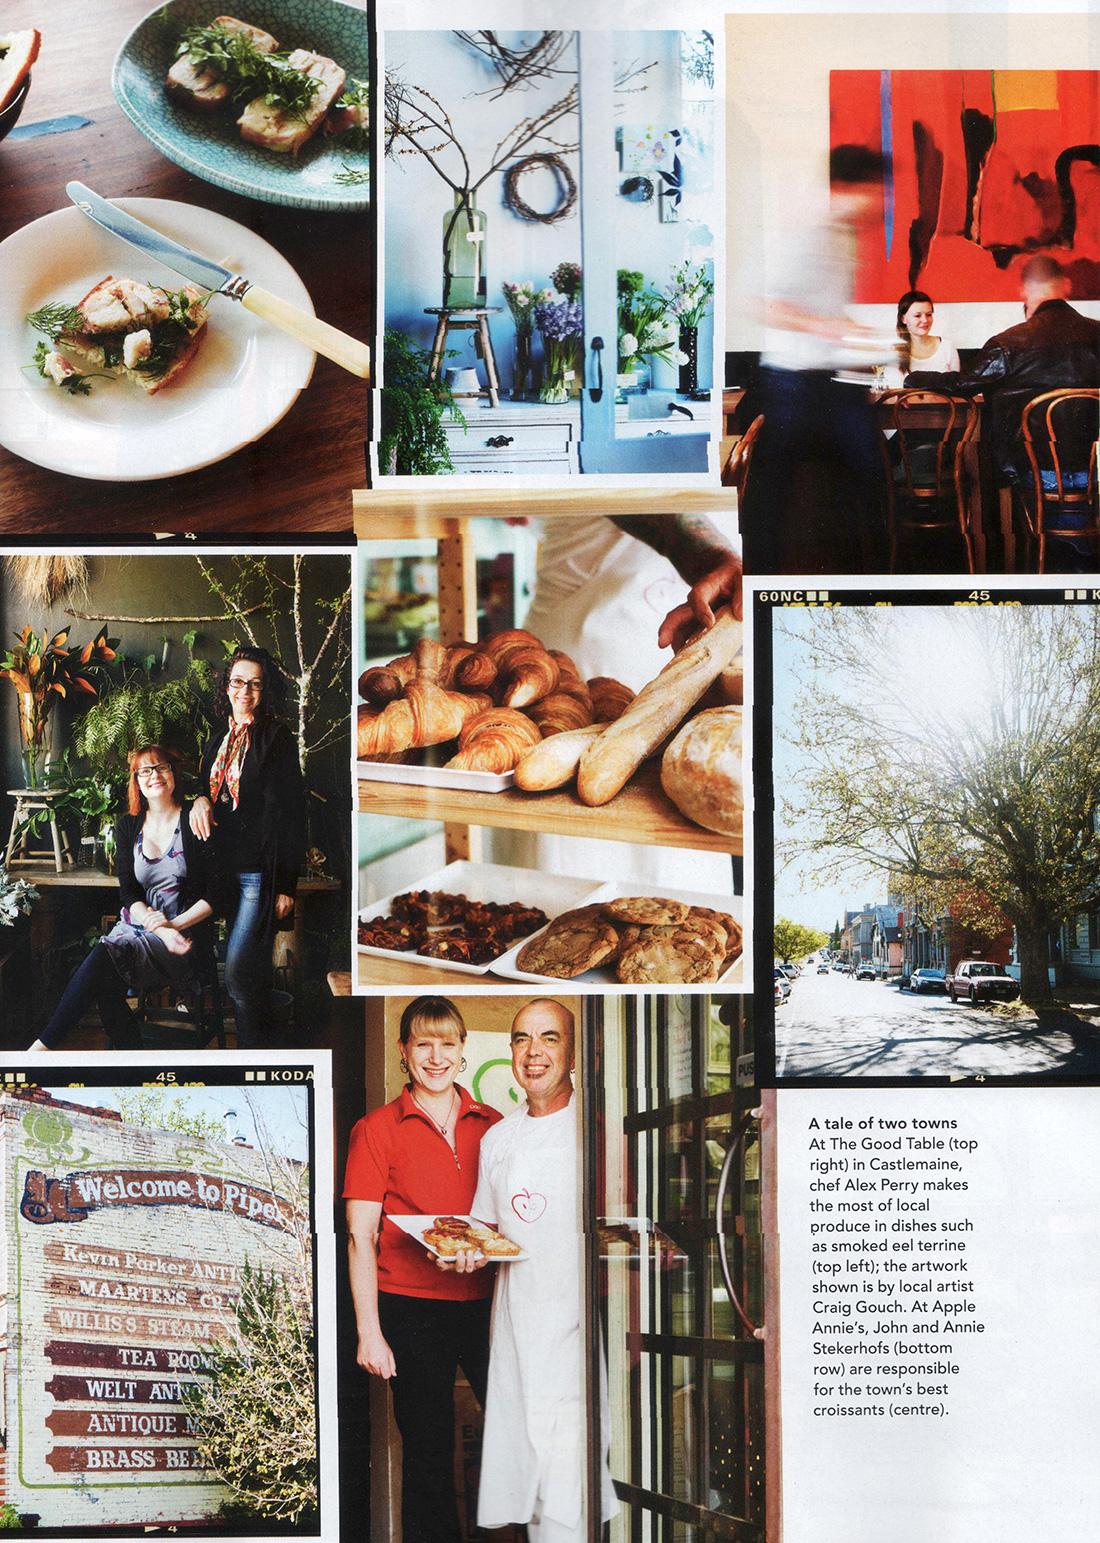 Gourmet-Traveller-Nov-2011-p189-.jpg